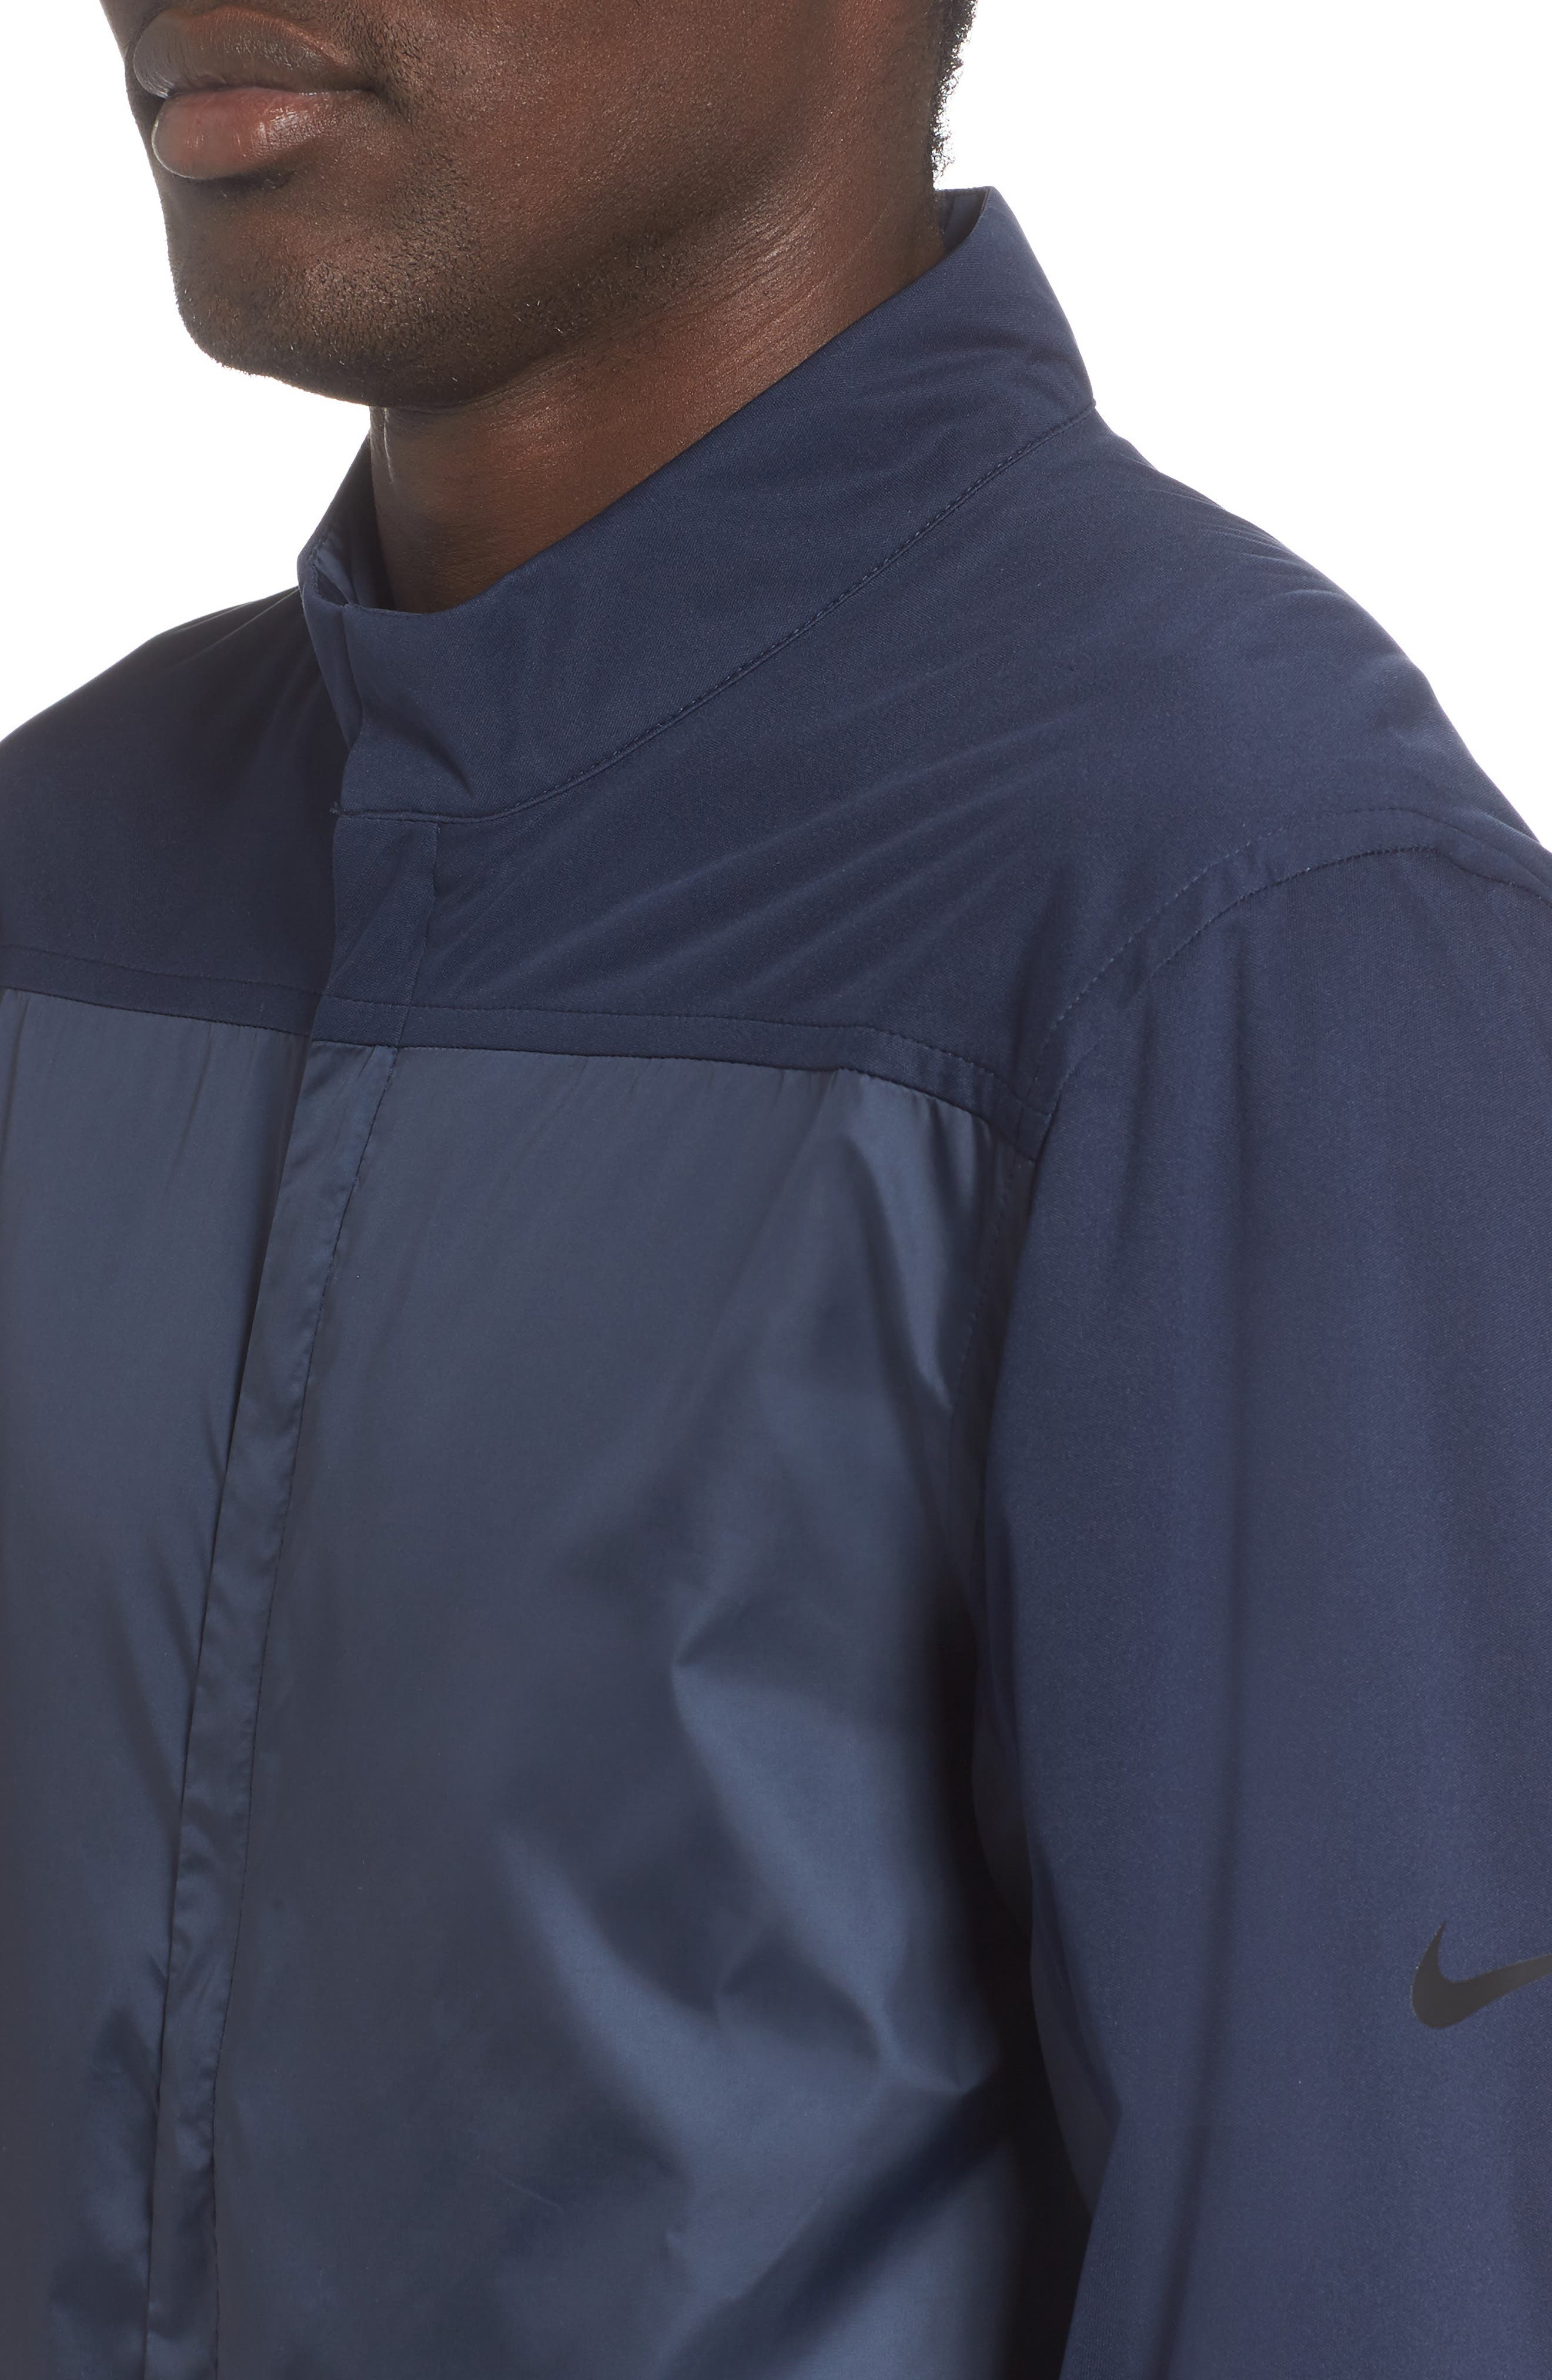 Shield Core Zip Golf Jacket,                             Alternate thumbnail 4, color,                             OBSIDIAN/ OBSIDIAN/ BLACK